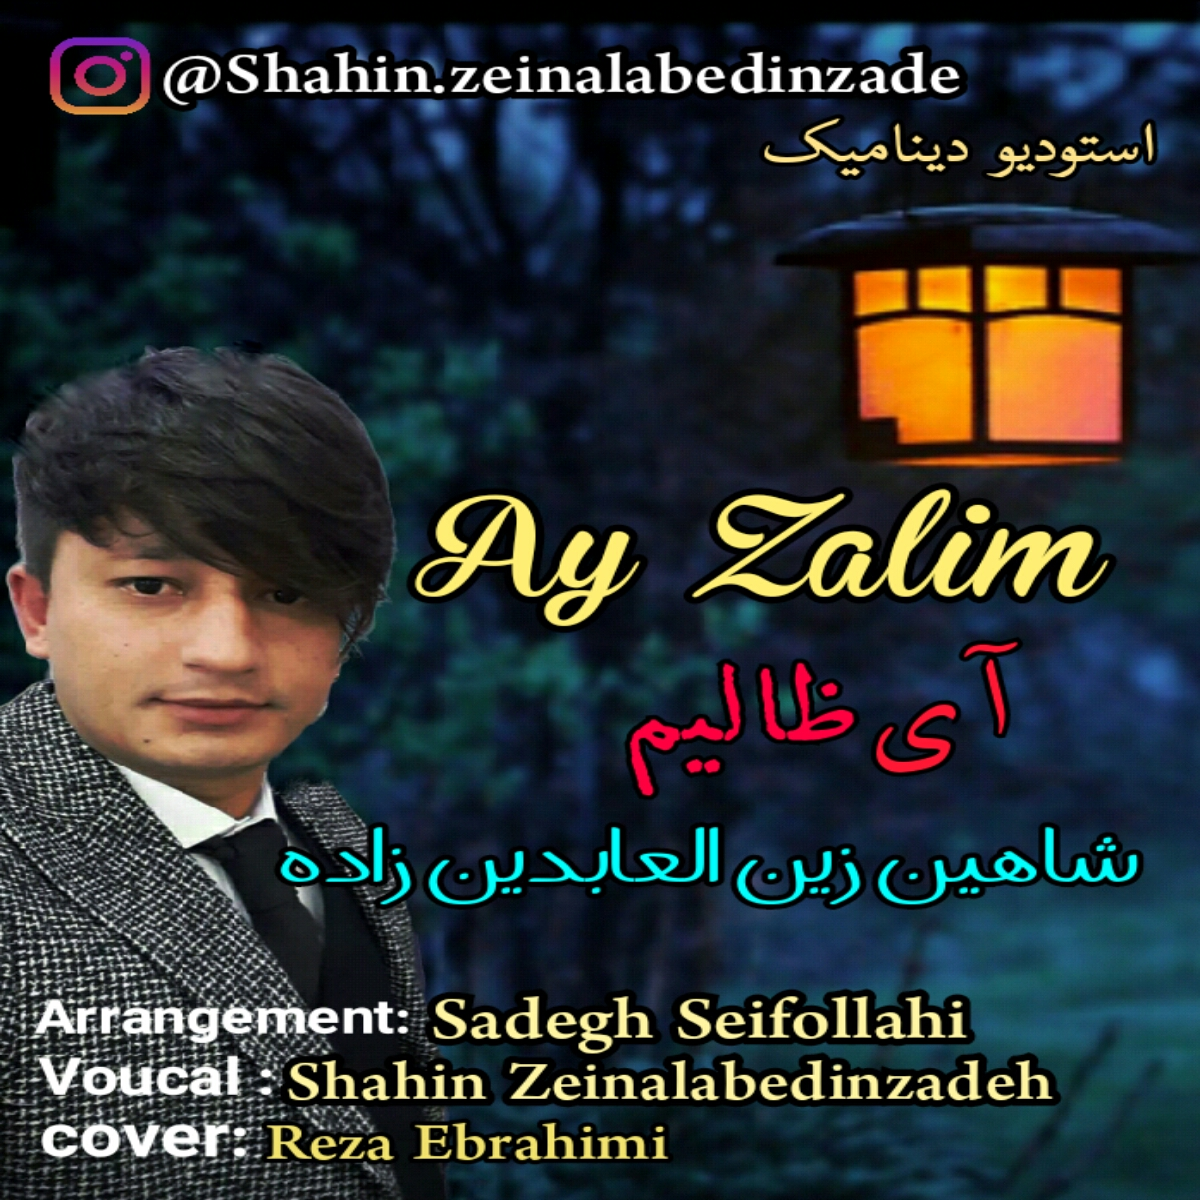 https://s16.picofile.com/file/8426277692/18Shahin_Zeinalabedinzadeh_Ay_Zalim.jpg